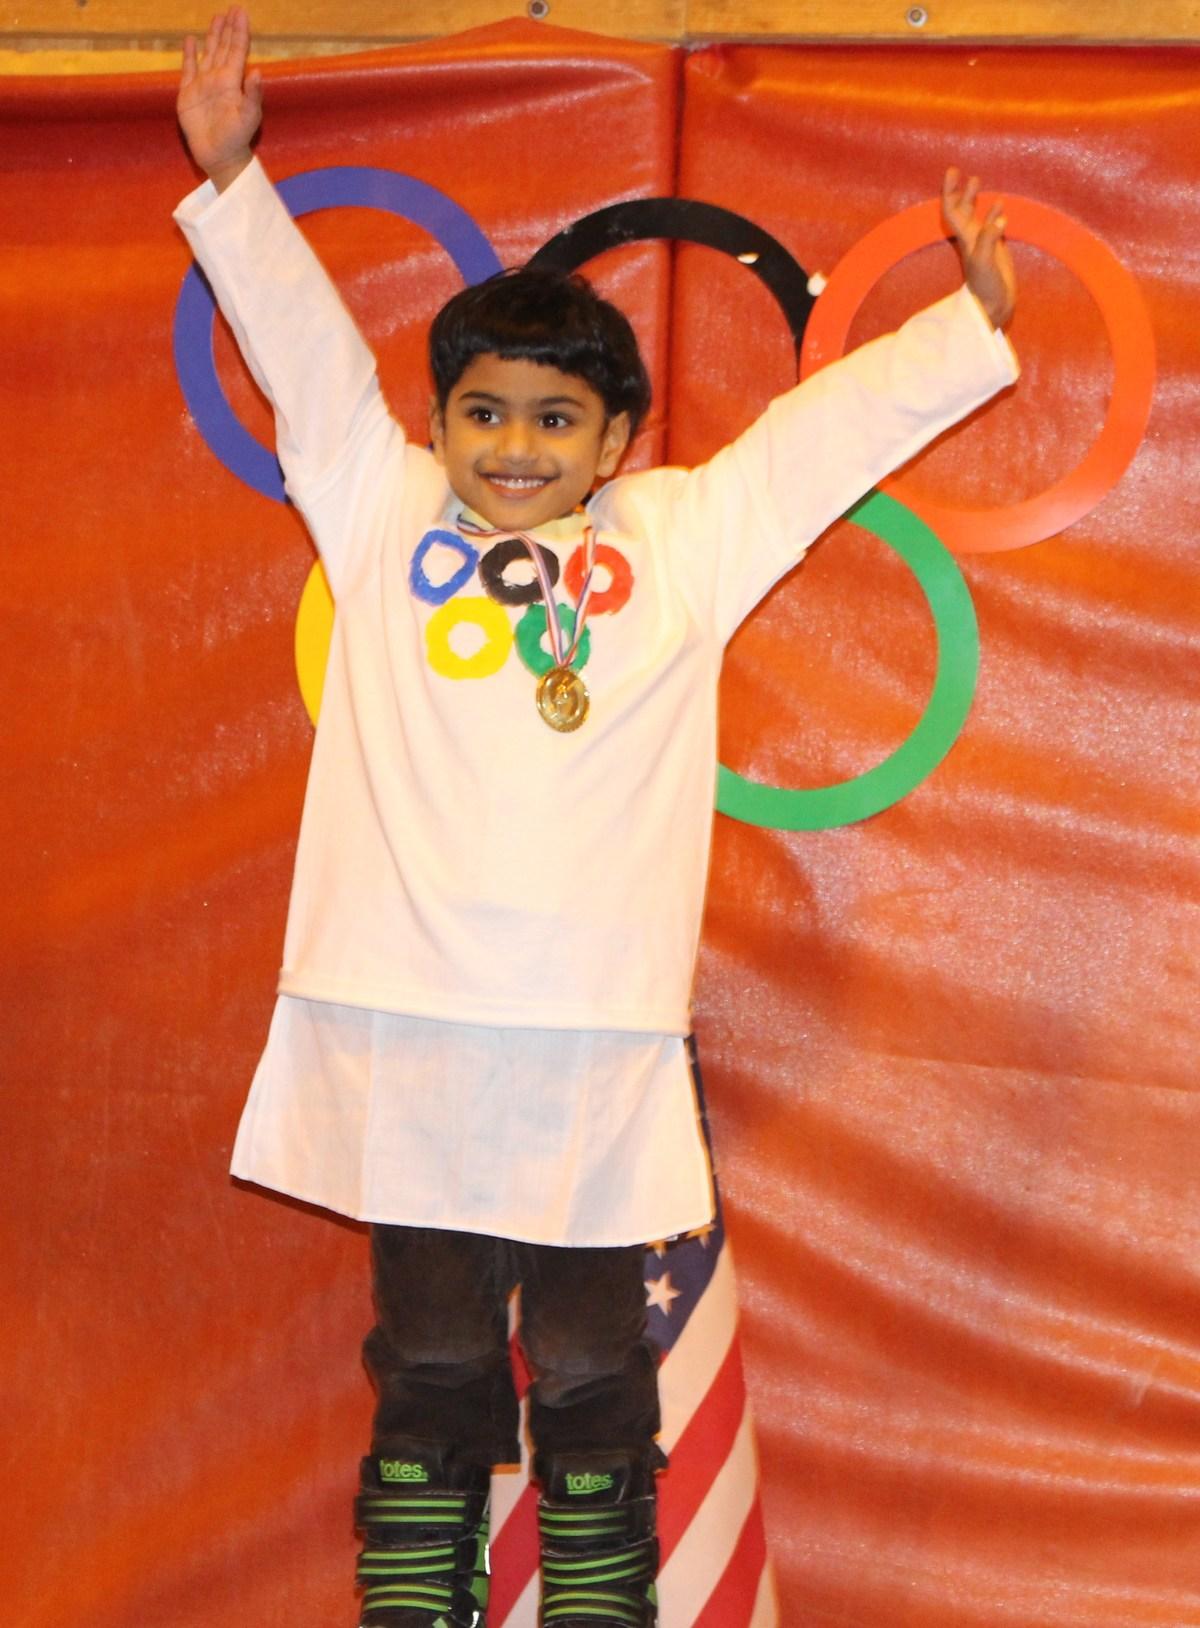 boy with Olympics shirt